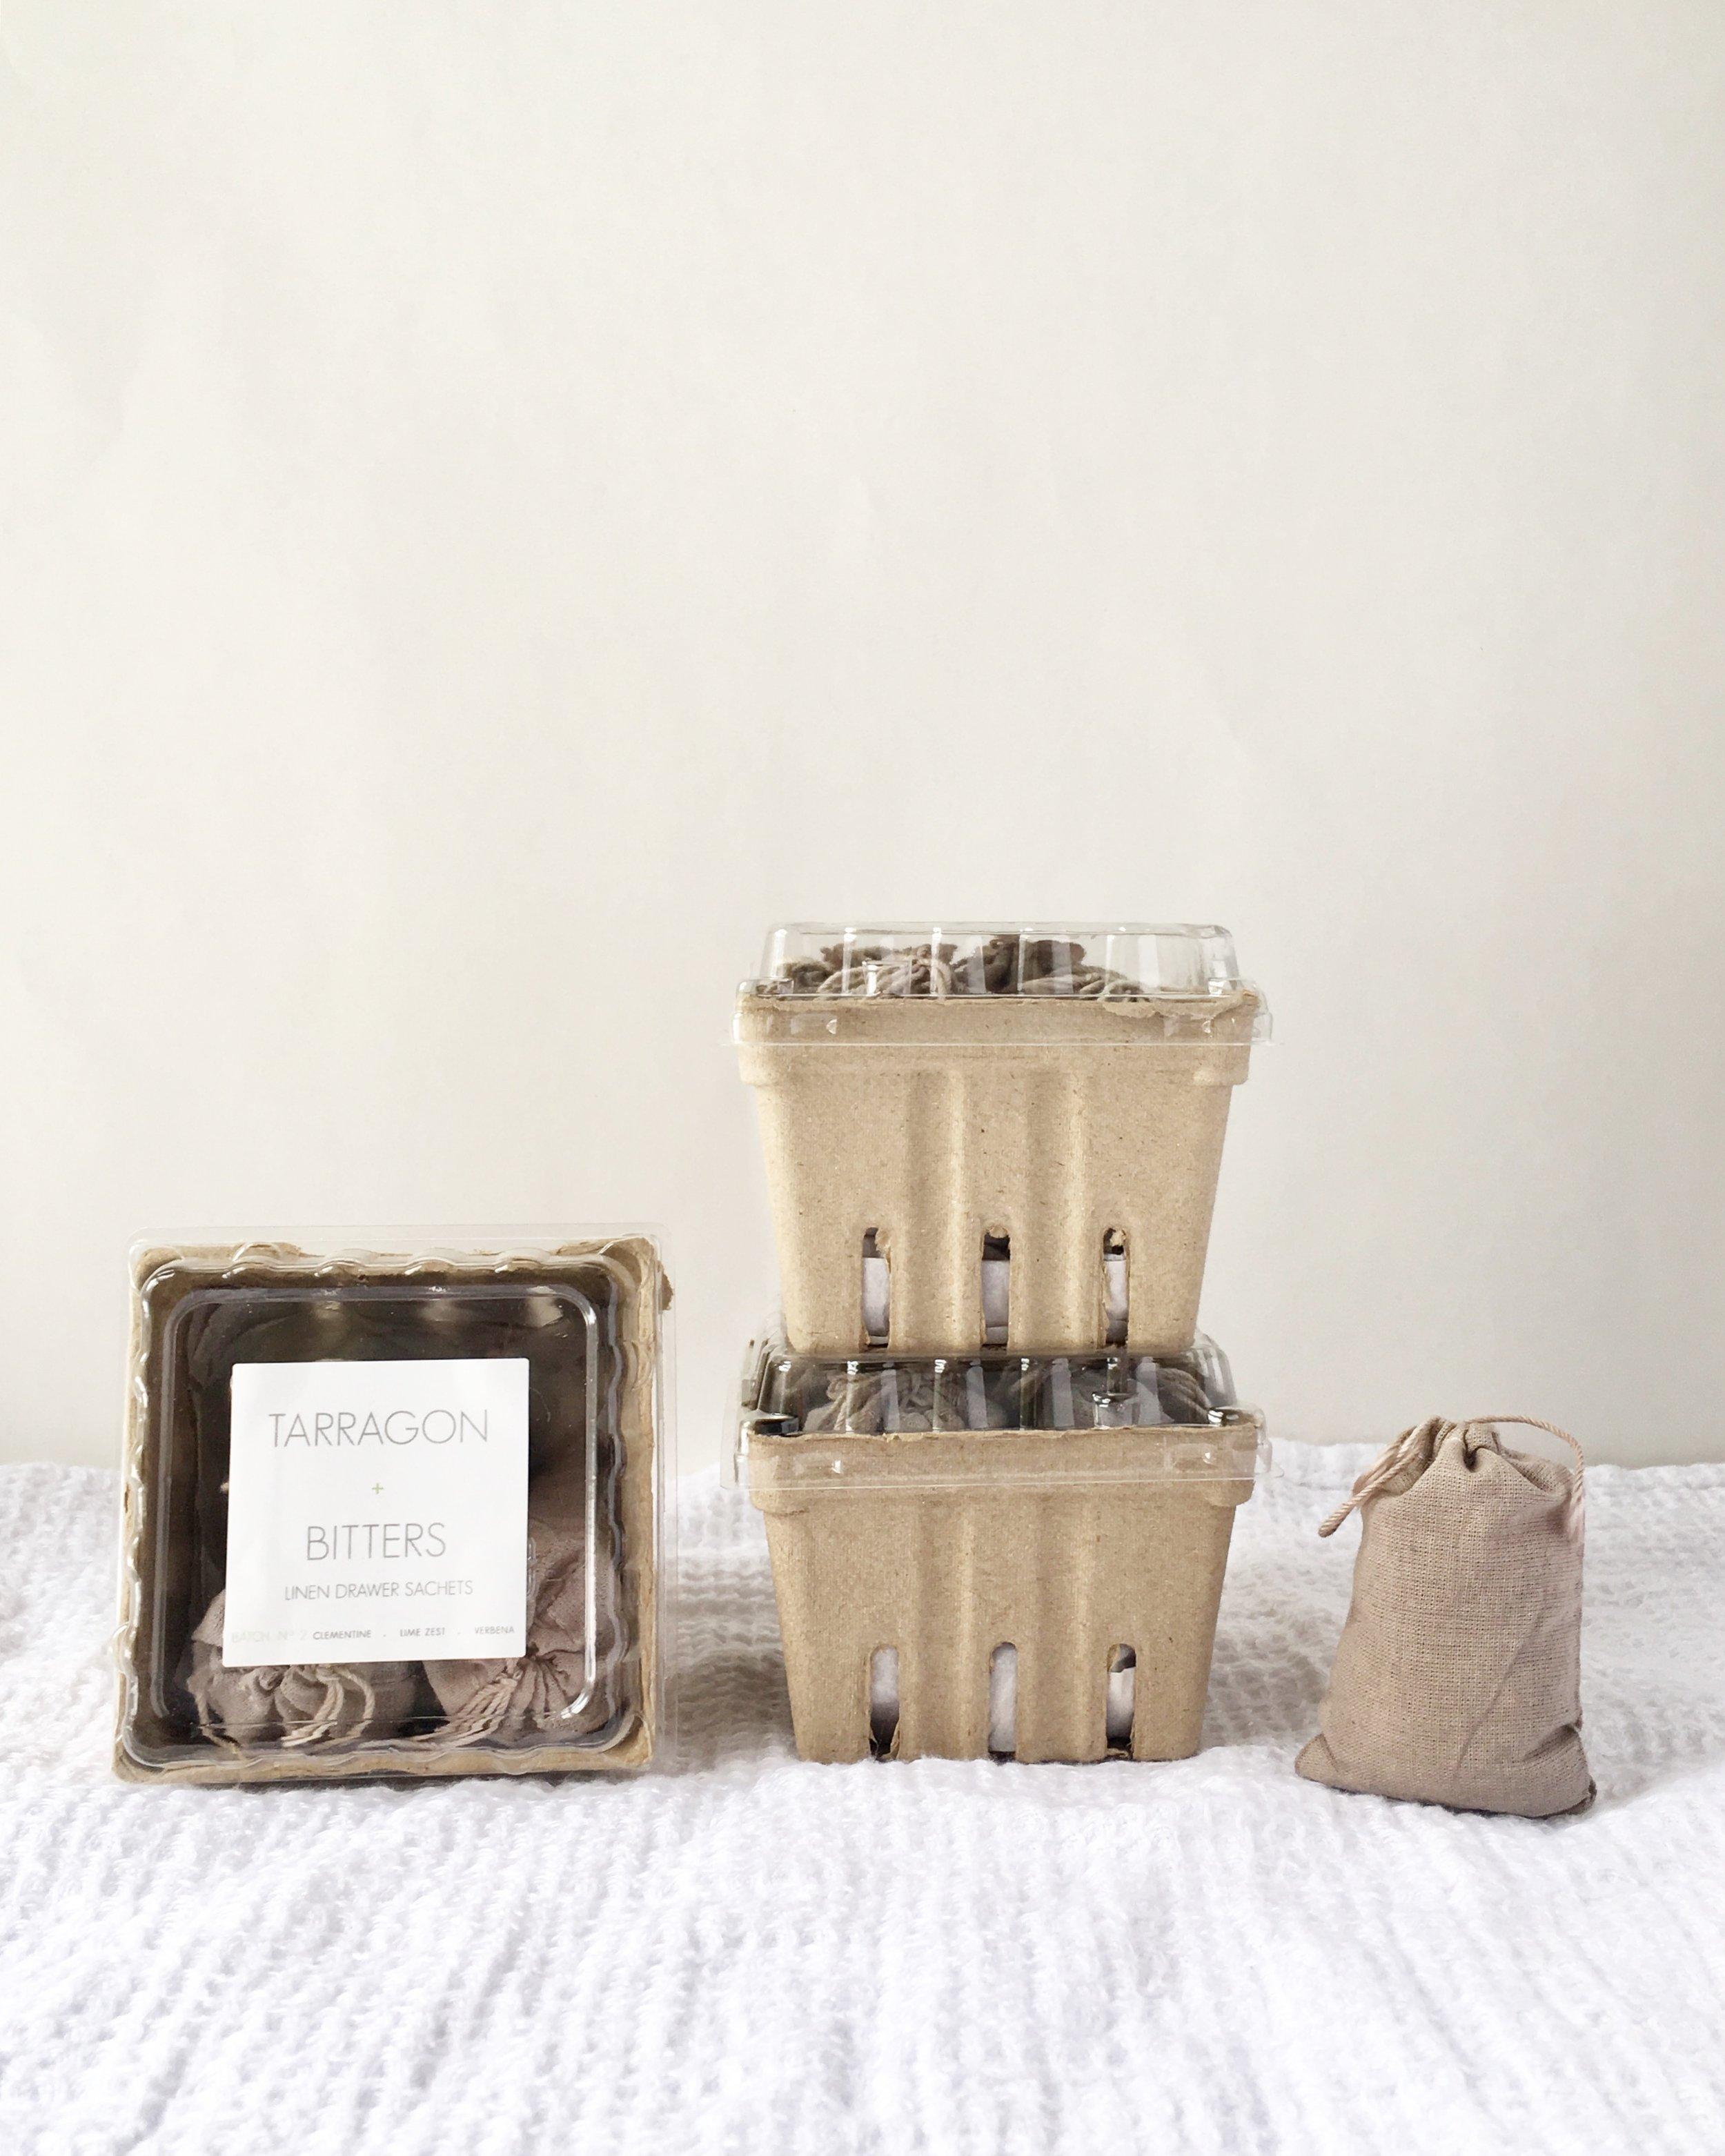 RICA bath + body Linen Drawer Sachets Tarragon + Bitters berry Basket stack.JPG